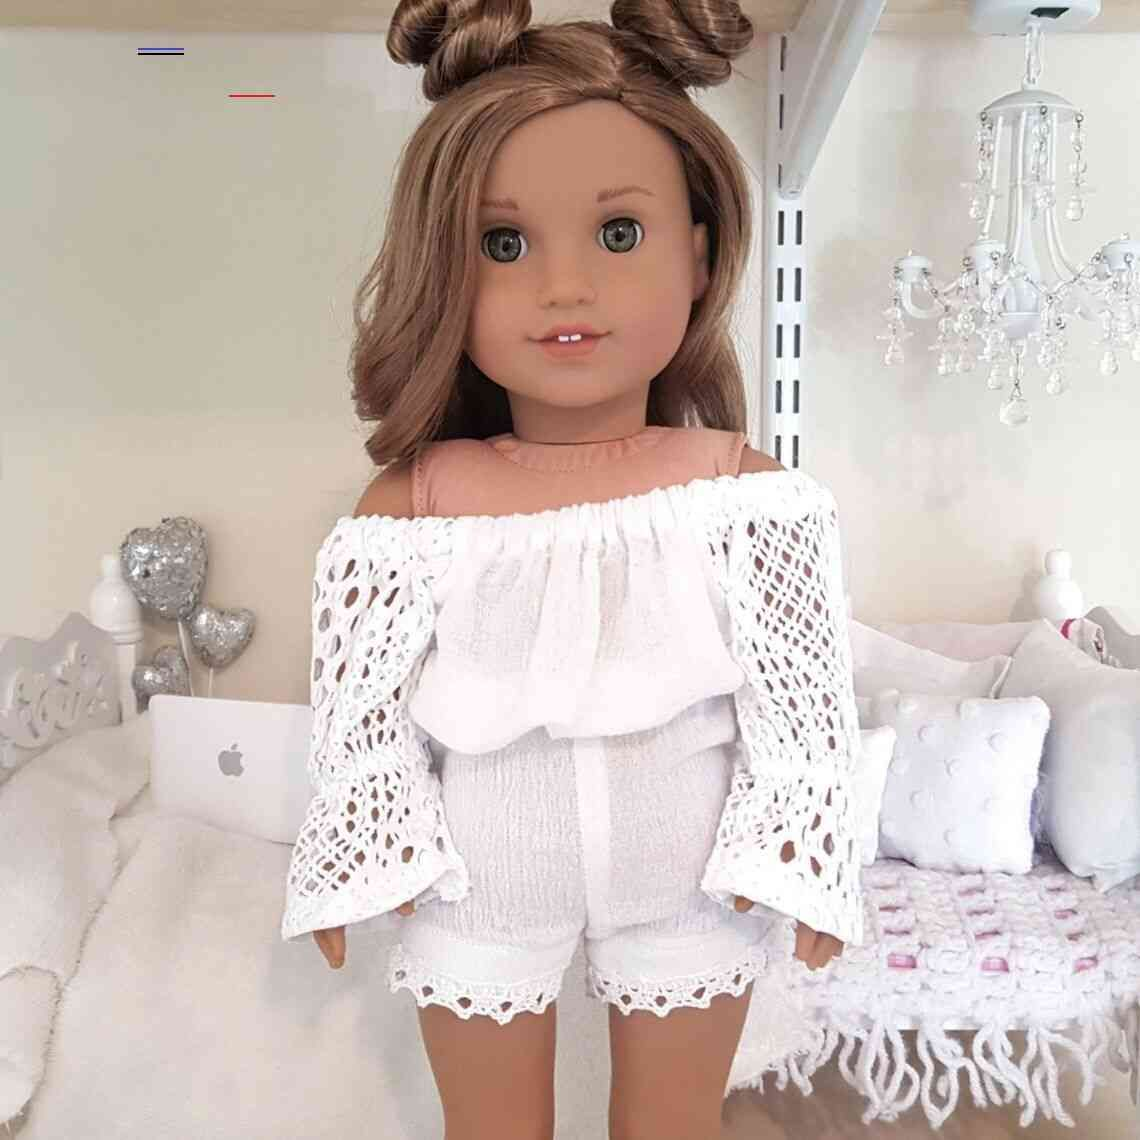 American Girl nostra generazione Costume Di Halloween capelli PIN18 pollici DOLL CLOTHES